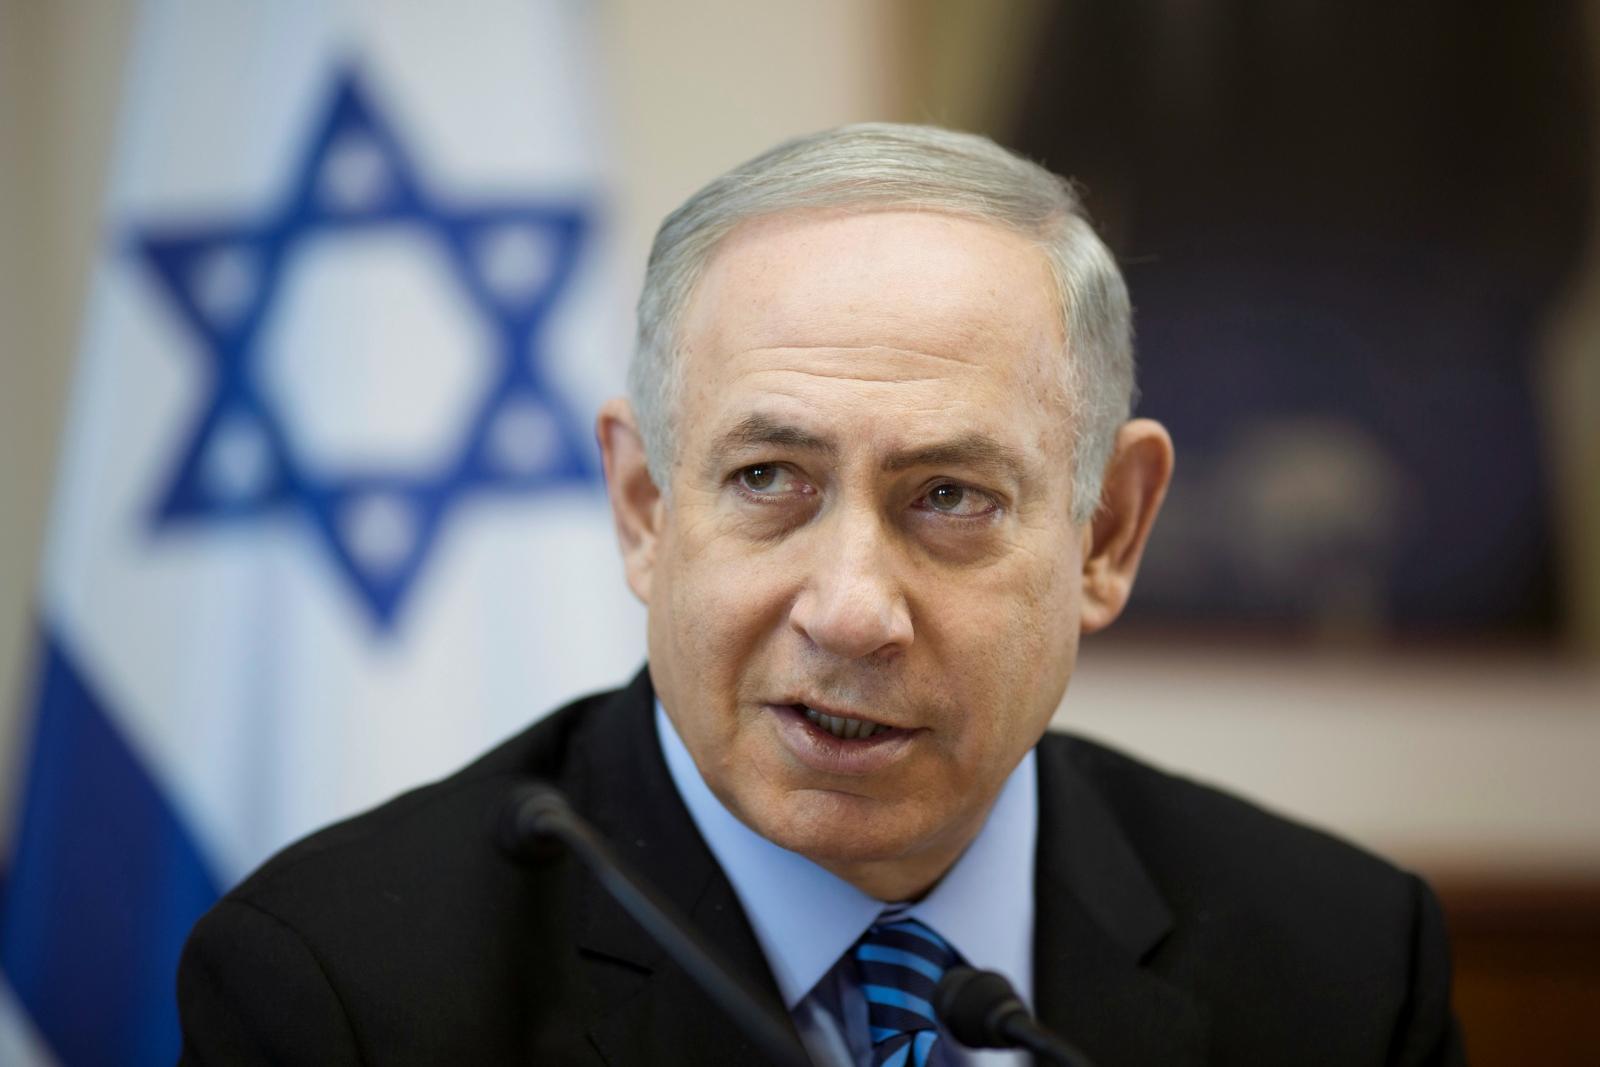 Image result for benjamin netanyahu angry